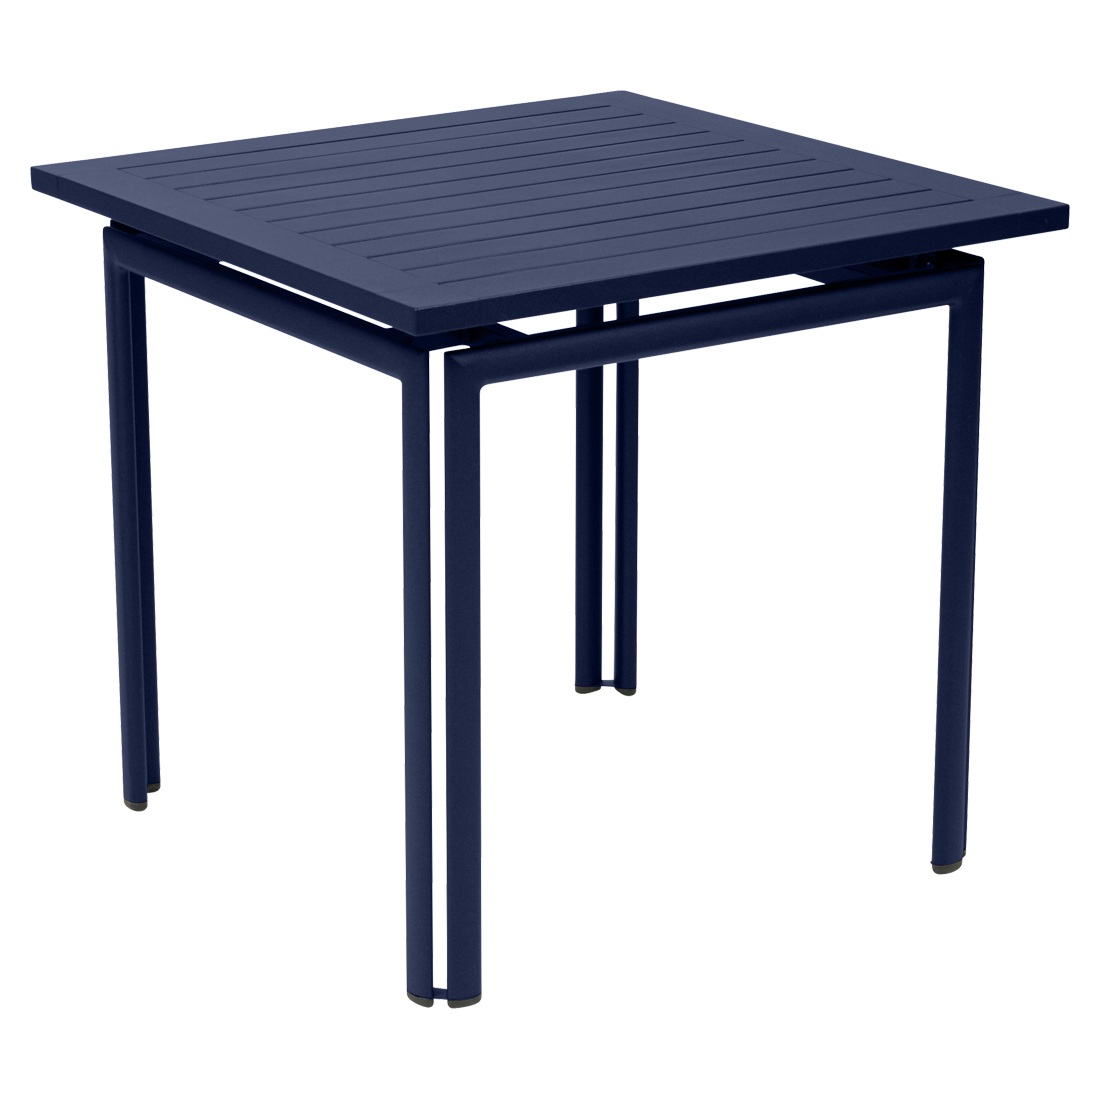 tavolo-fermob-costa-cm-80-x-80